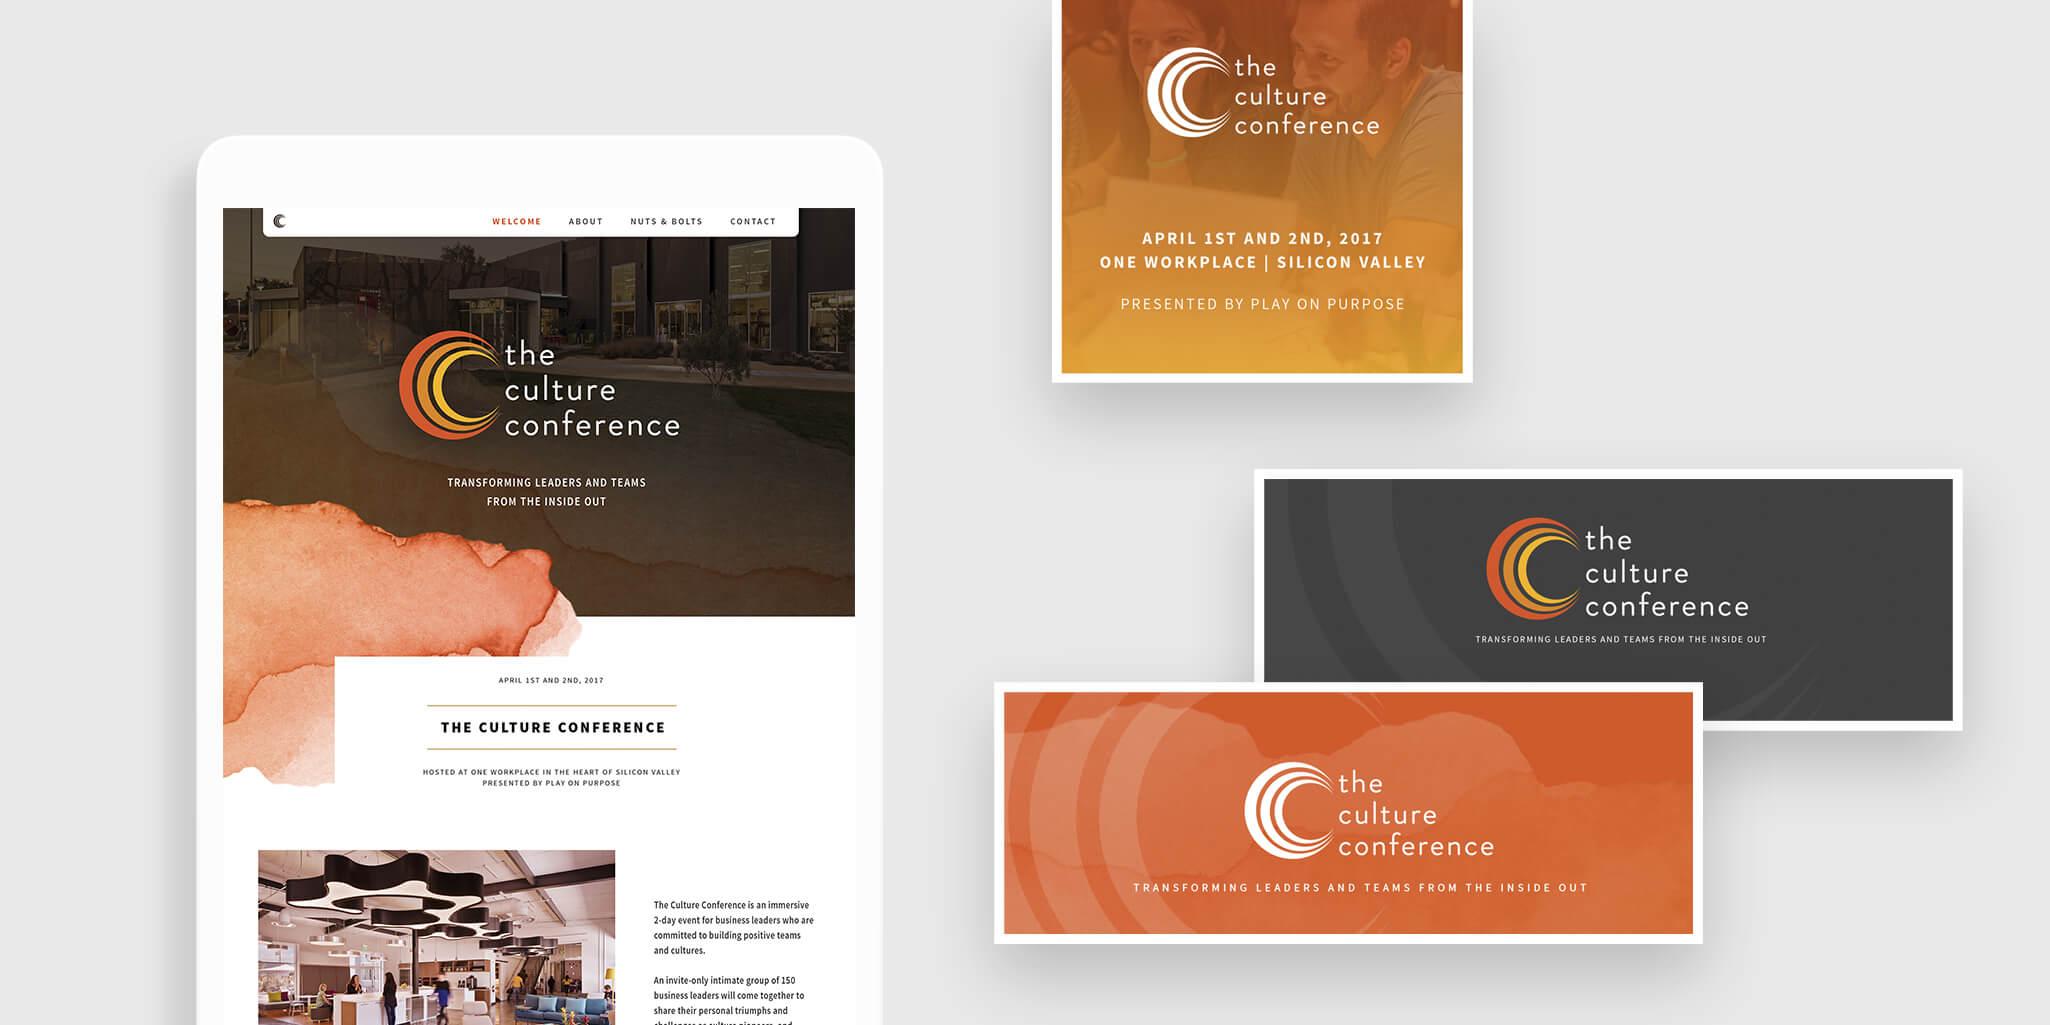 Culture Conference web mockups and social media graphics